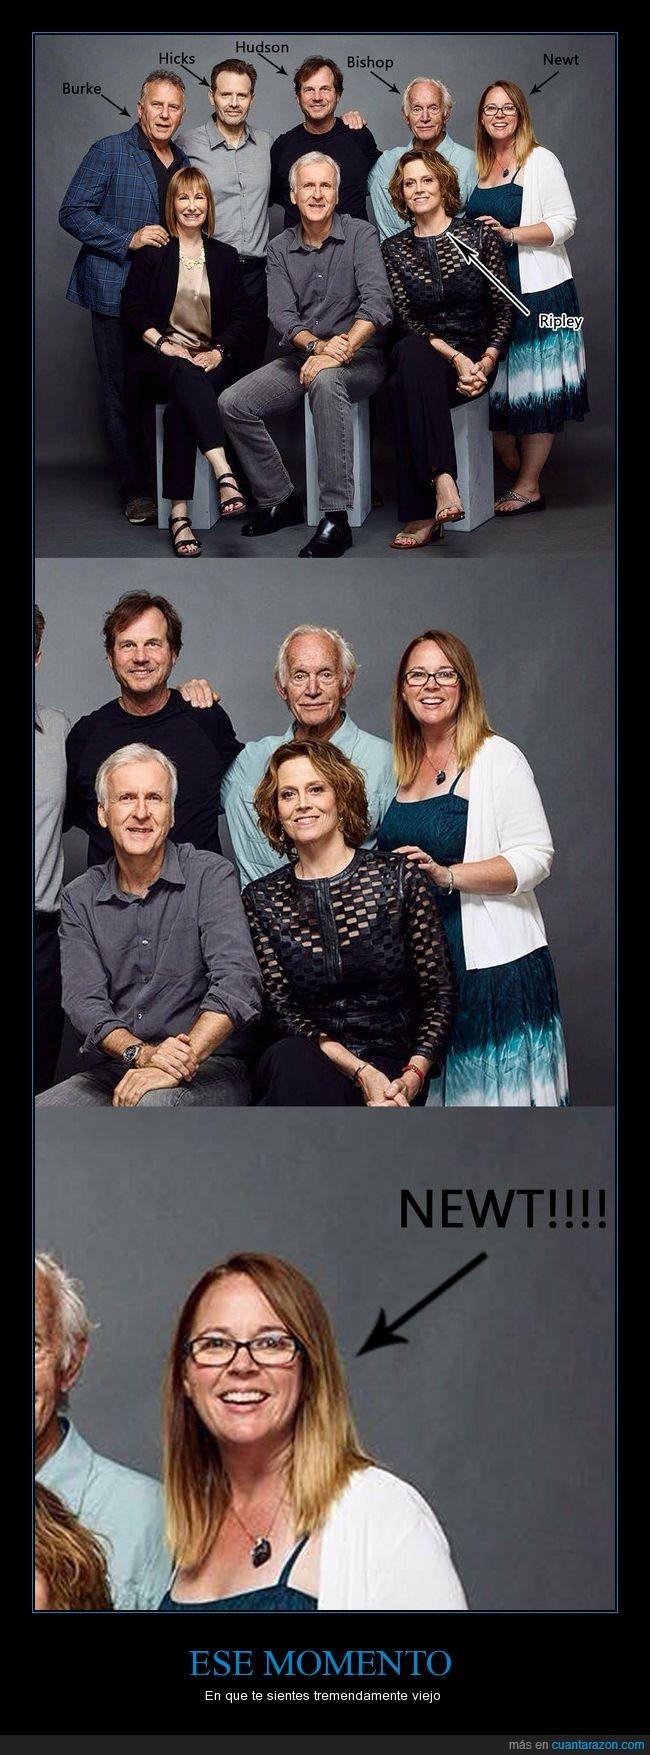 actriz,alien,Aliens,ese momento,Newt,viejo